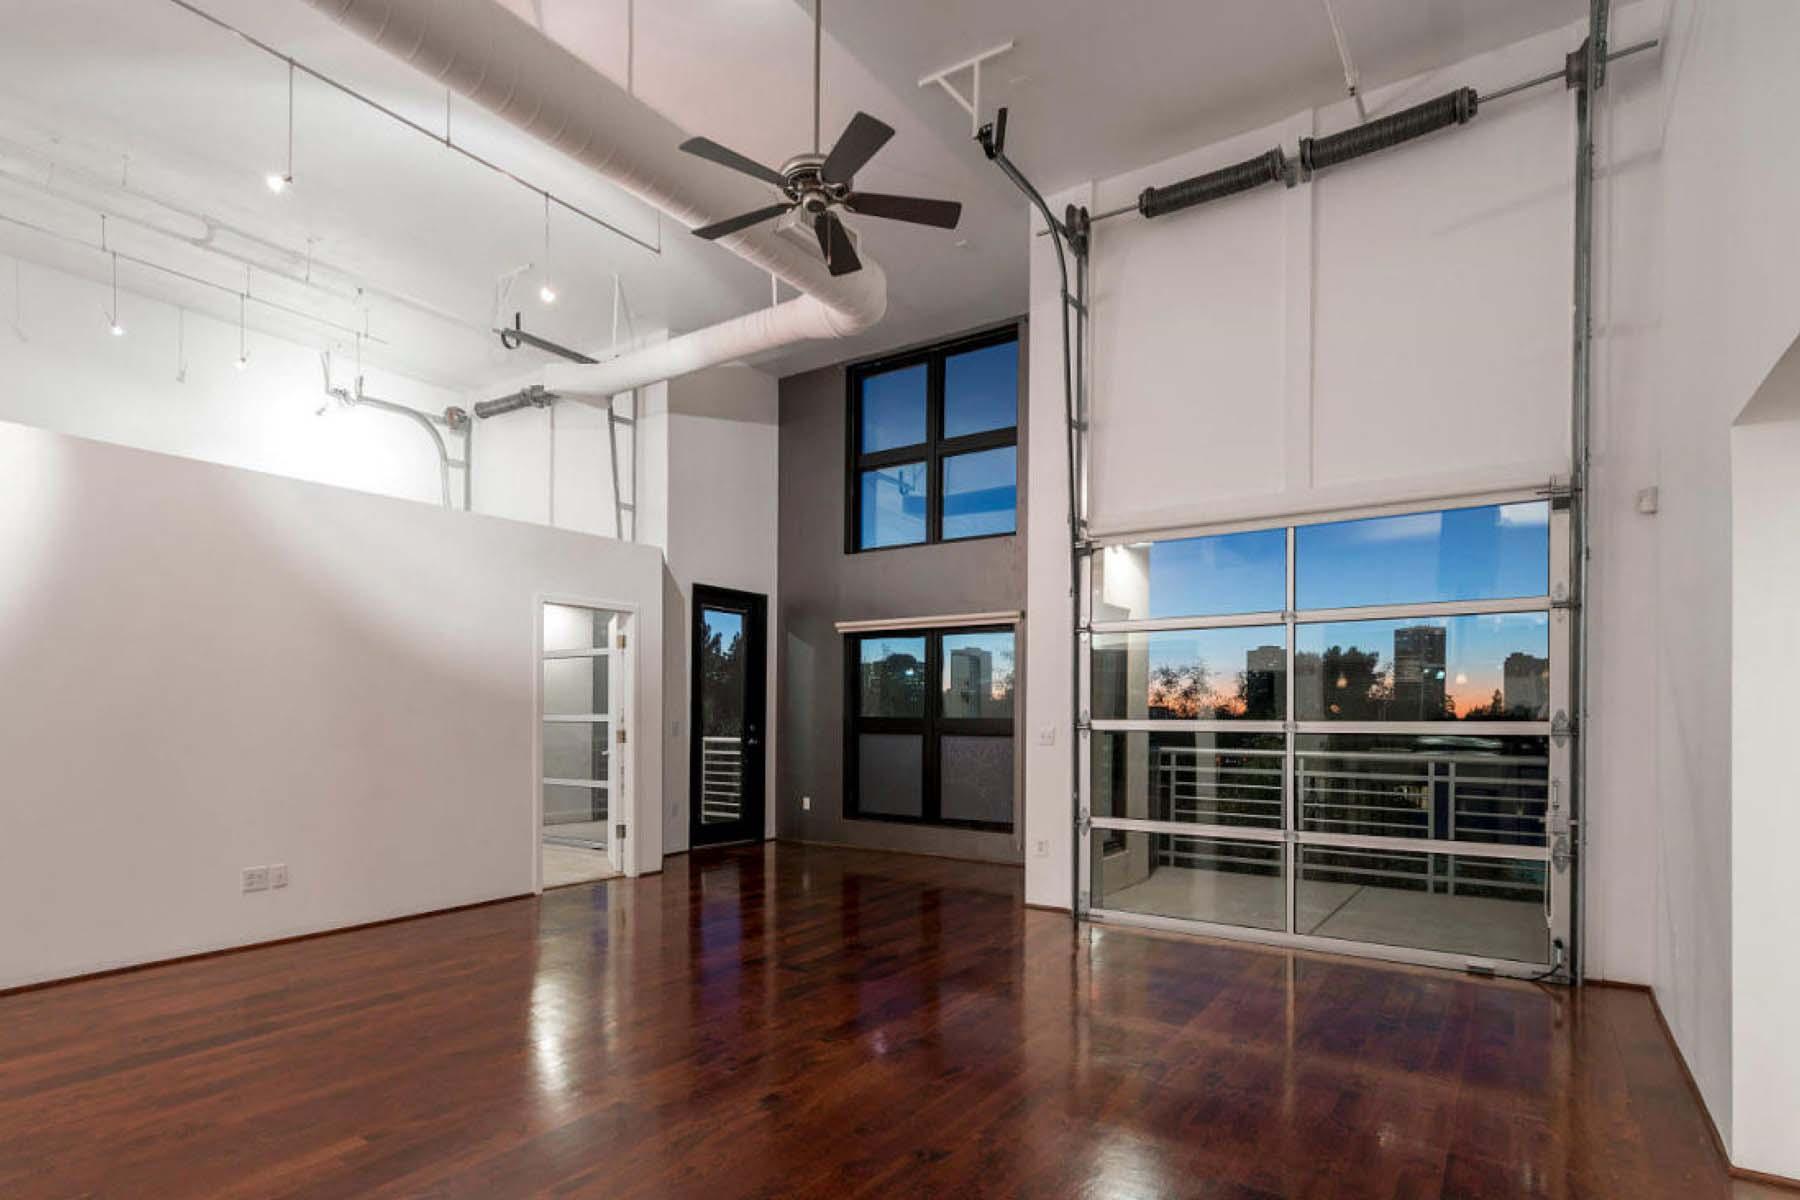 Konak için Satış at One-of-a-Kind Artisan Loft Comprised Of Three Original Units 914 E Osborn Road #405 Phoenix, Arizona 85014 Amerika Birleşik Devletleri